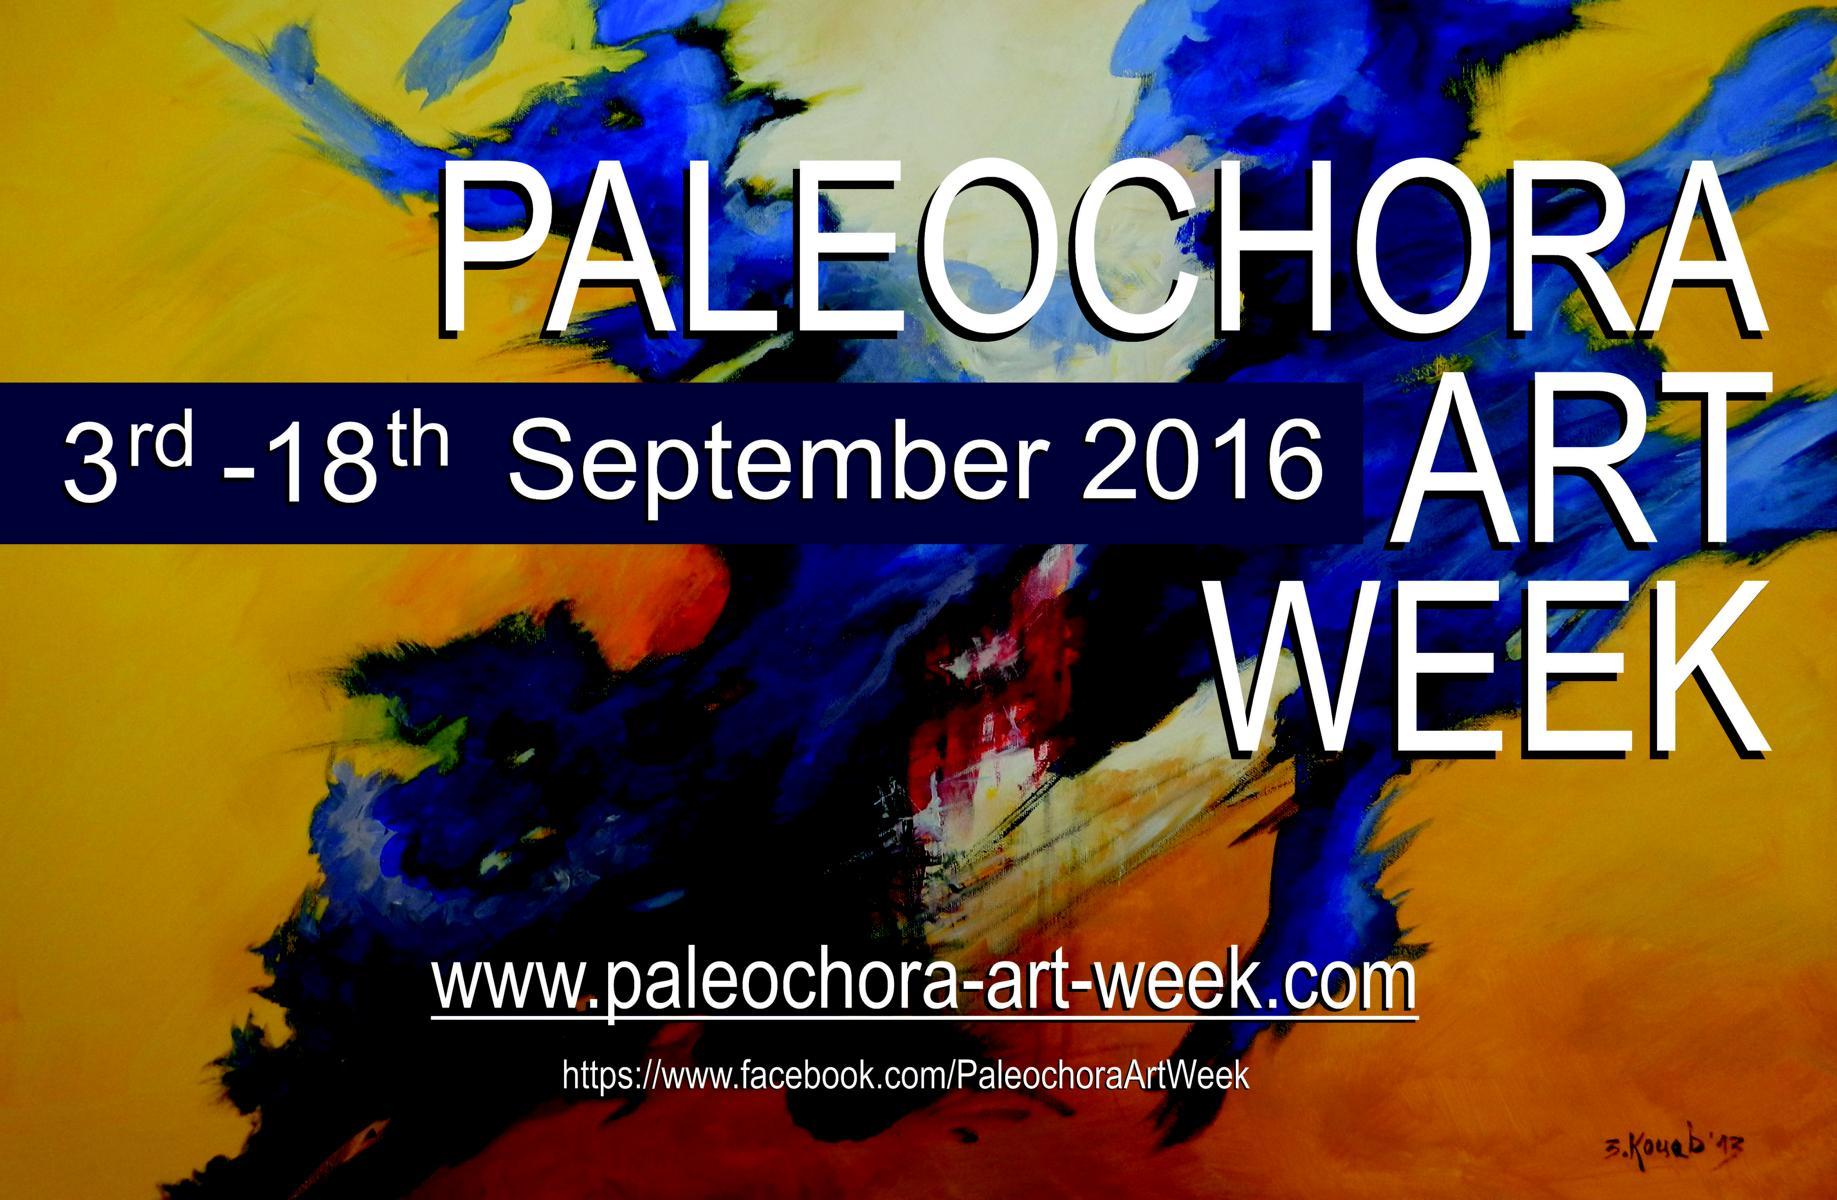 Paleochora Art Week 2016